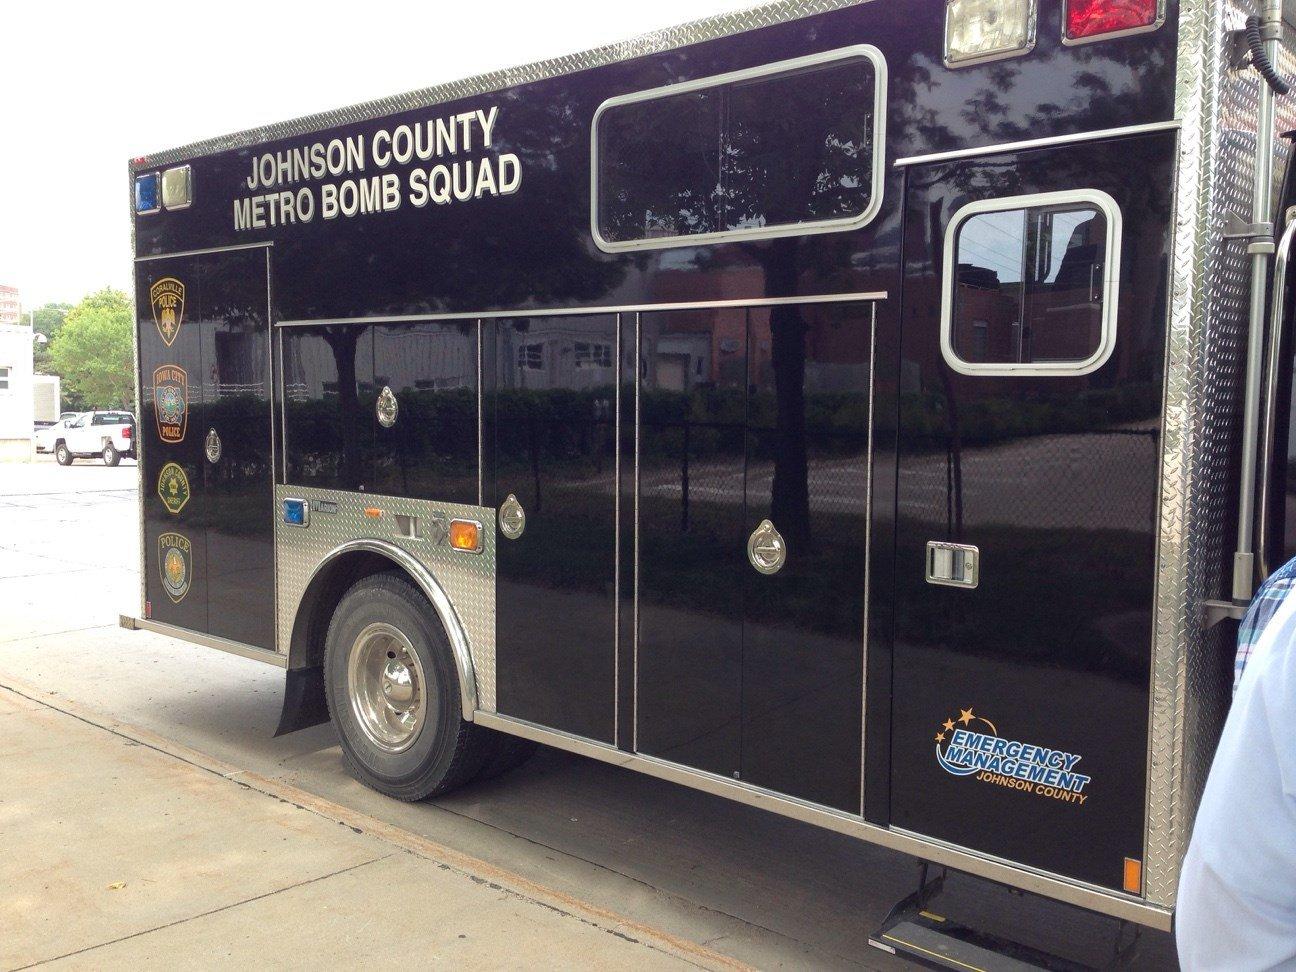 Bomb squad crews on scene at the University of Iowa on Monday, Aug. 17. (Justin Andrews, KWWL)